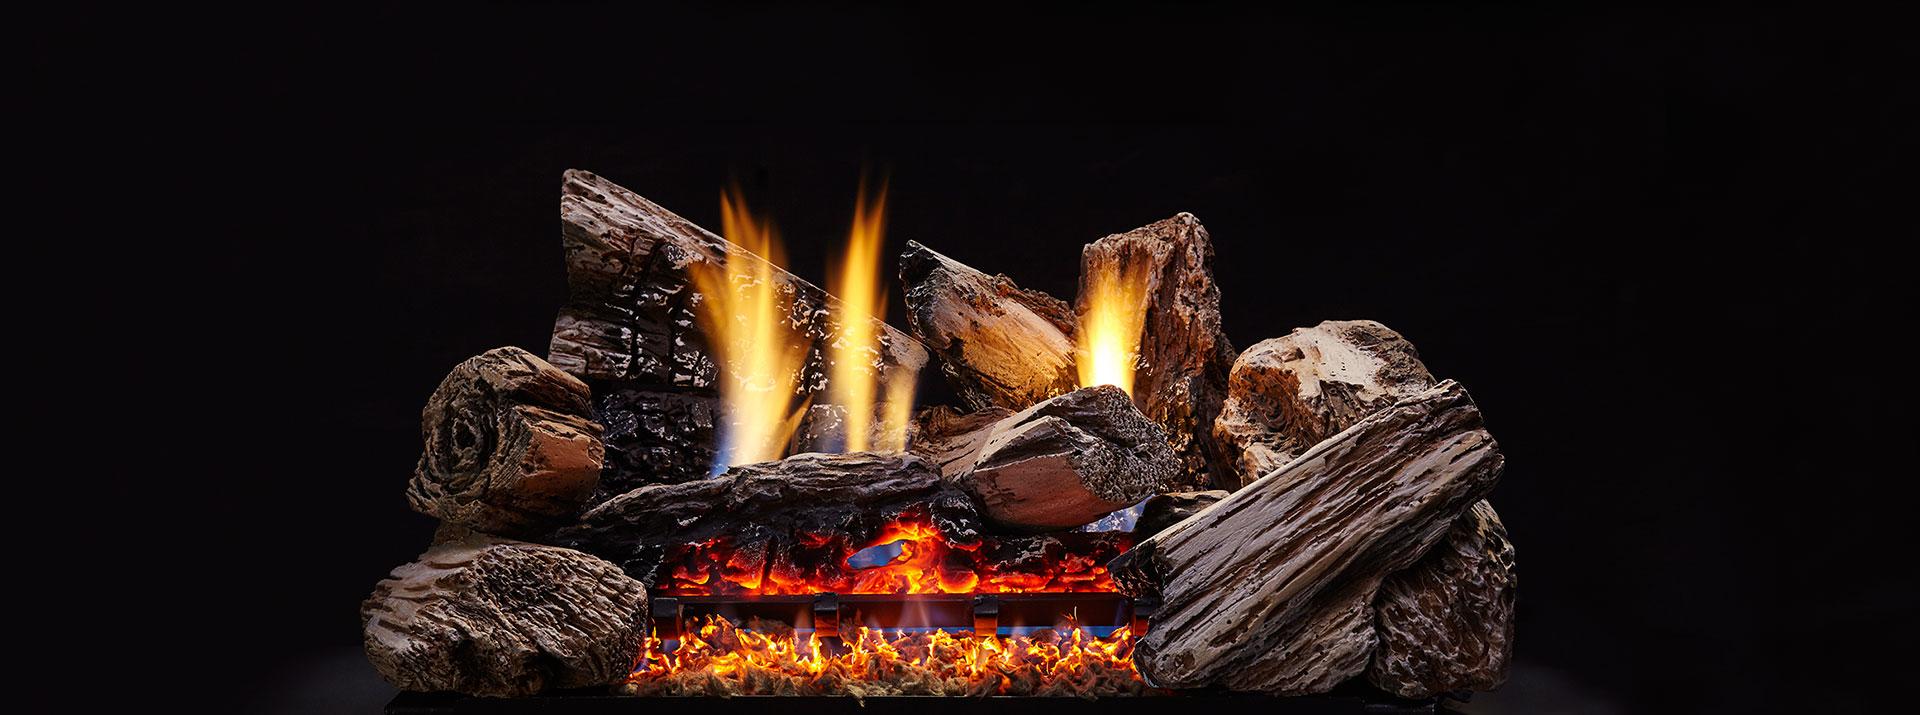 "Monessen MX24-H 24"" Burncrete Hybrid 8 pc Moxie Log Set - LOGS ONLY"